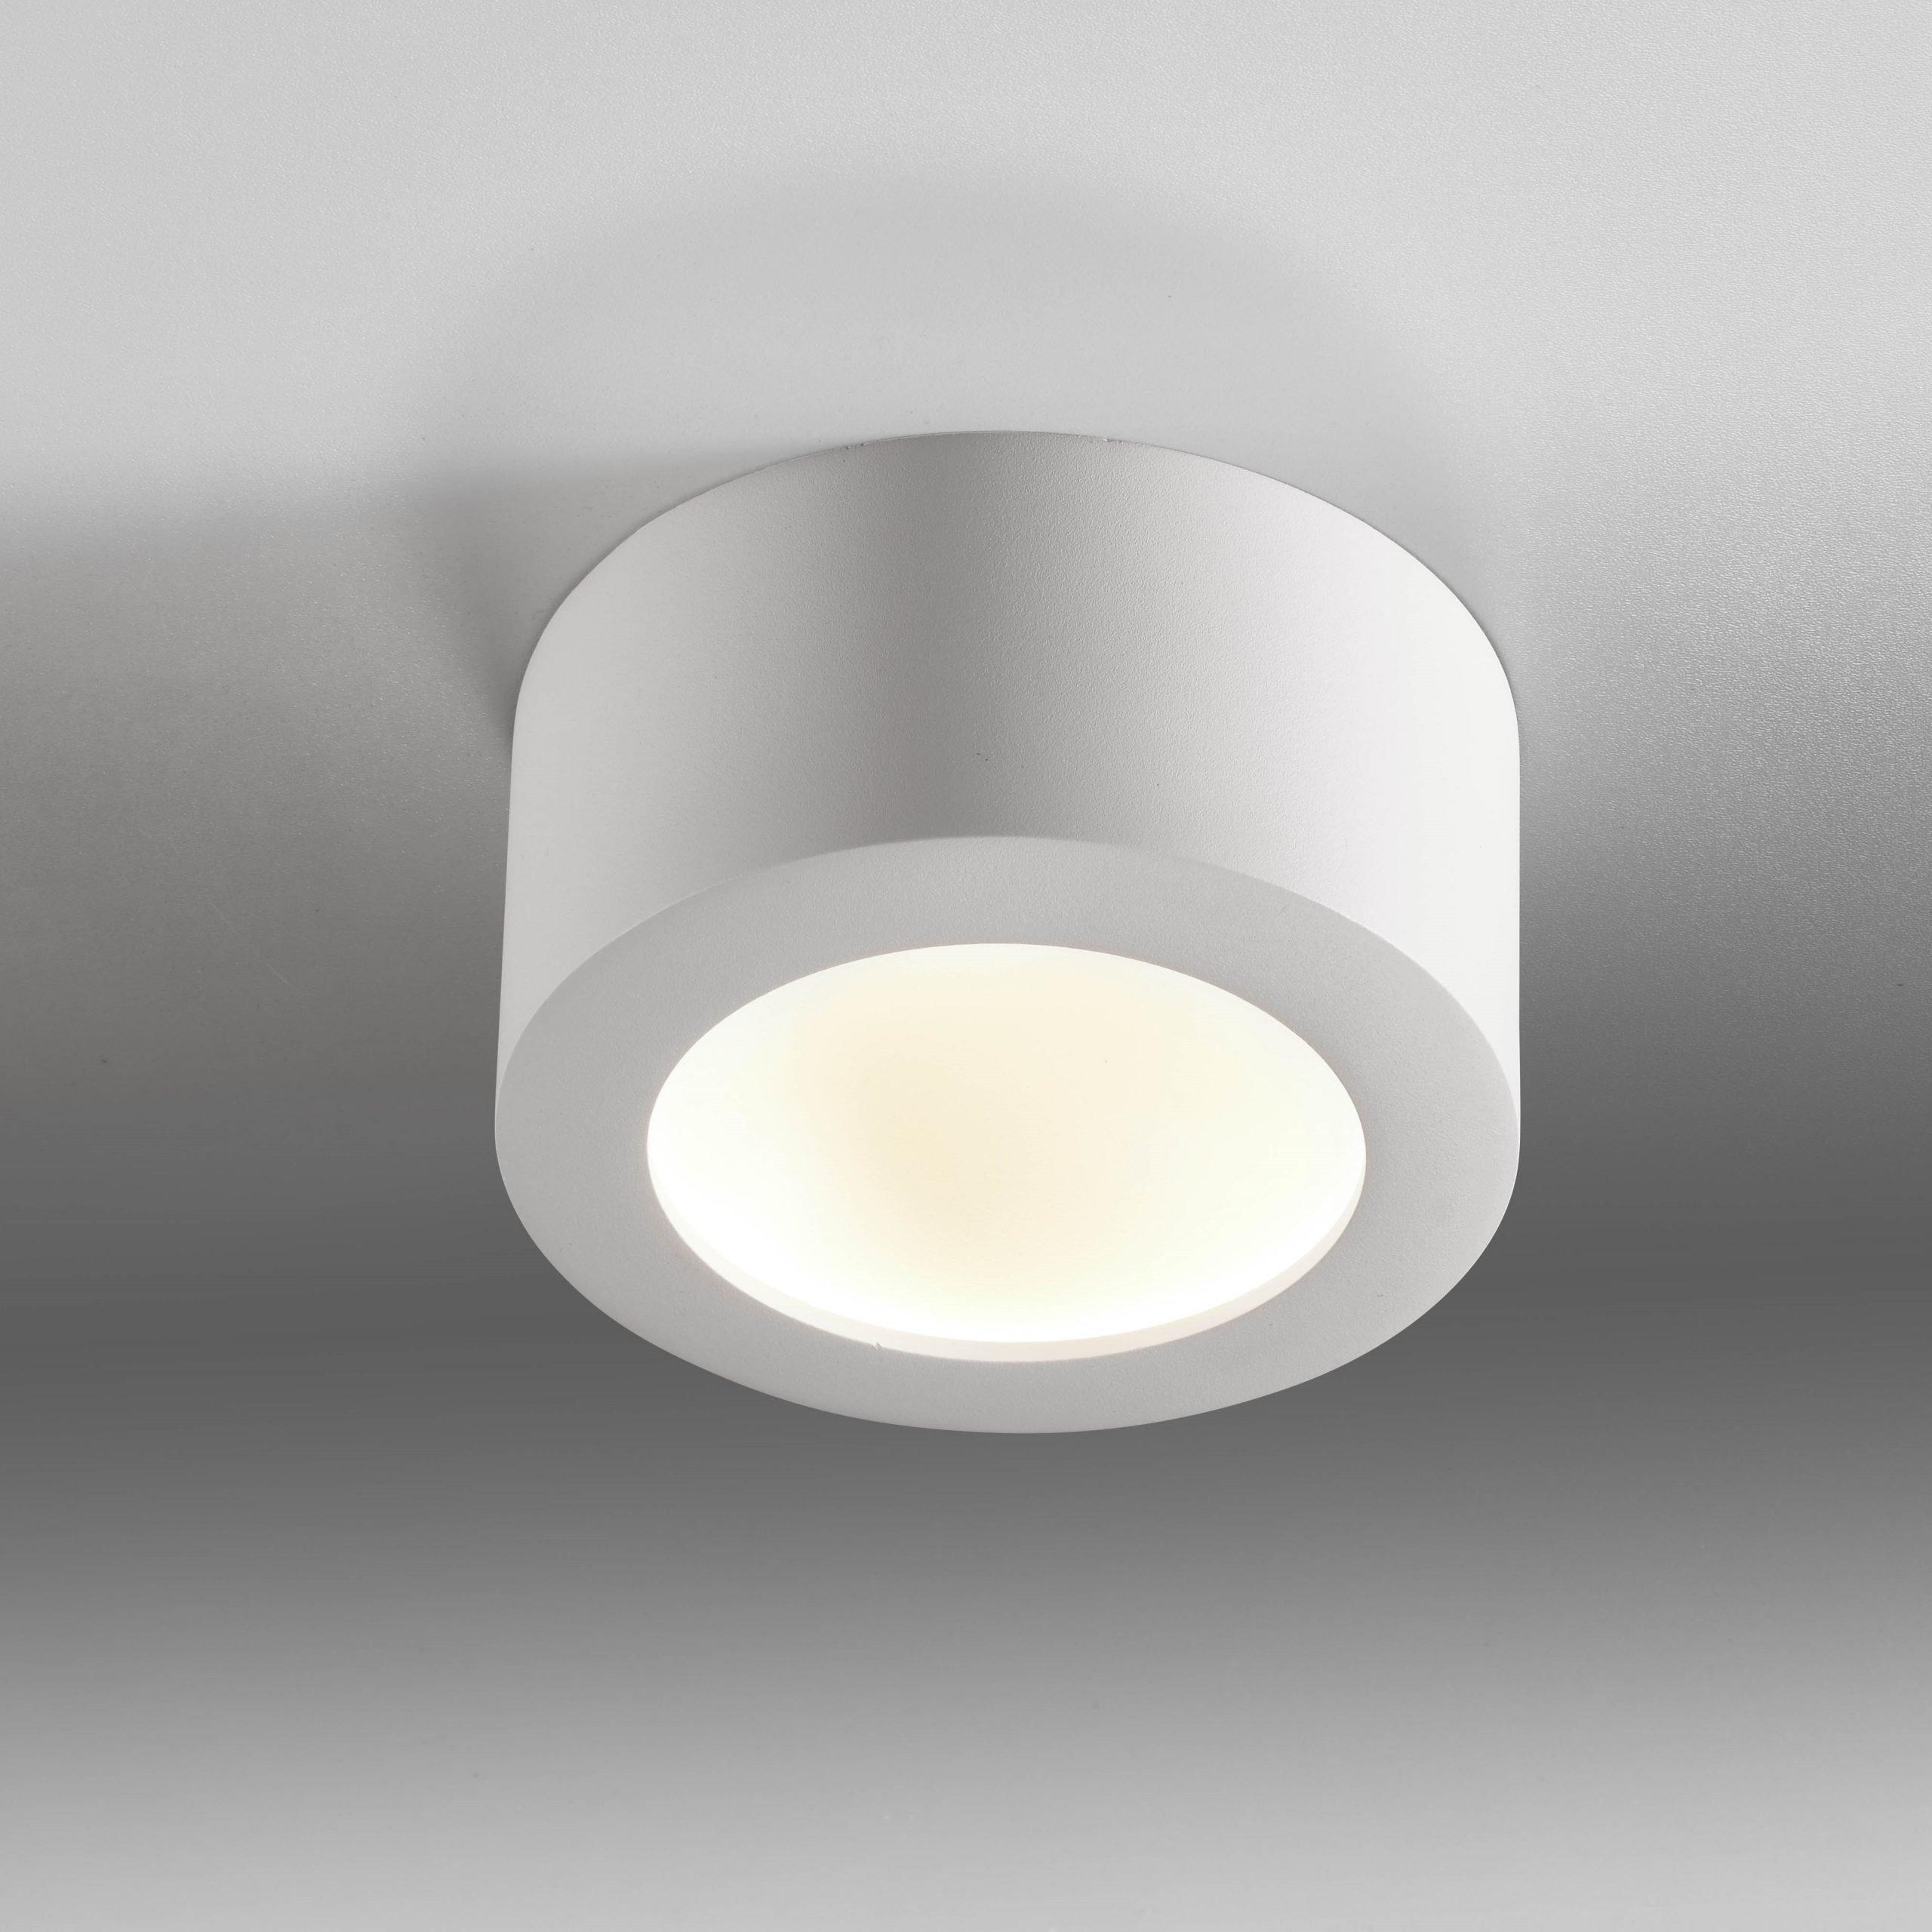 Plafondlamp Bowl Wit Small